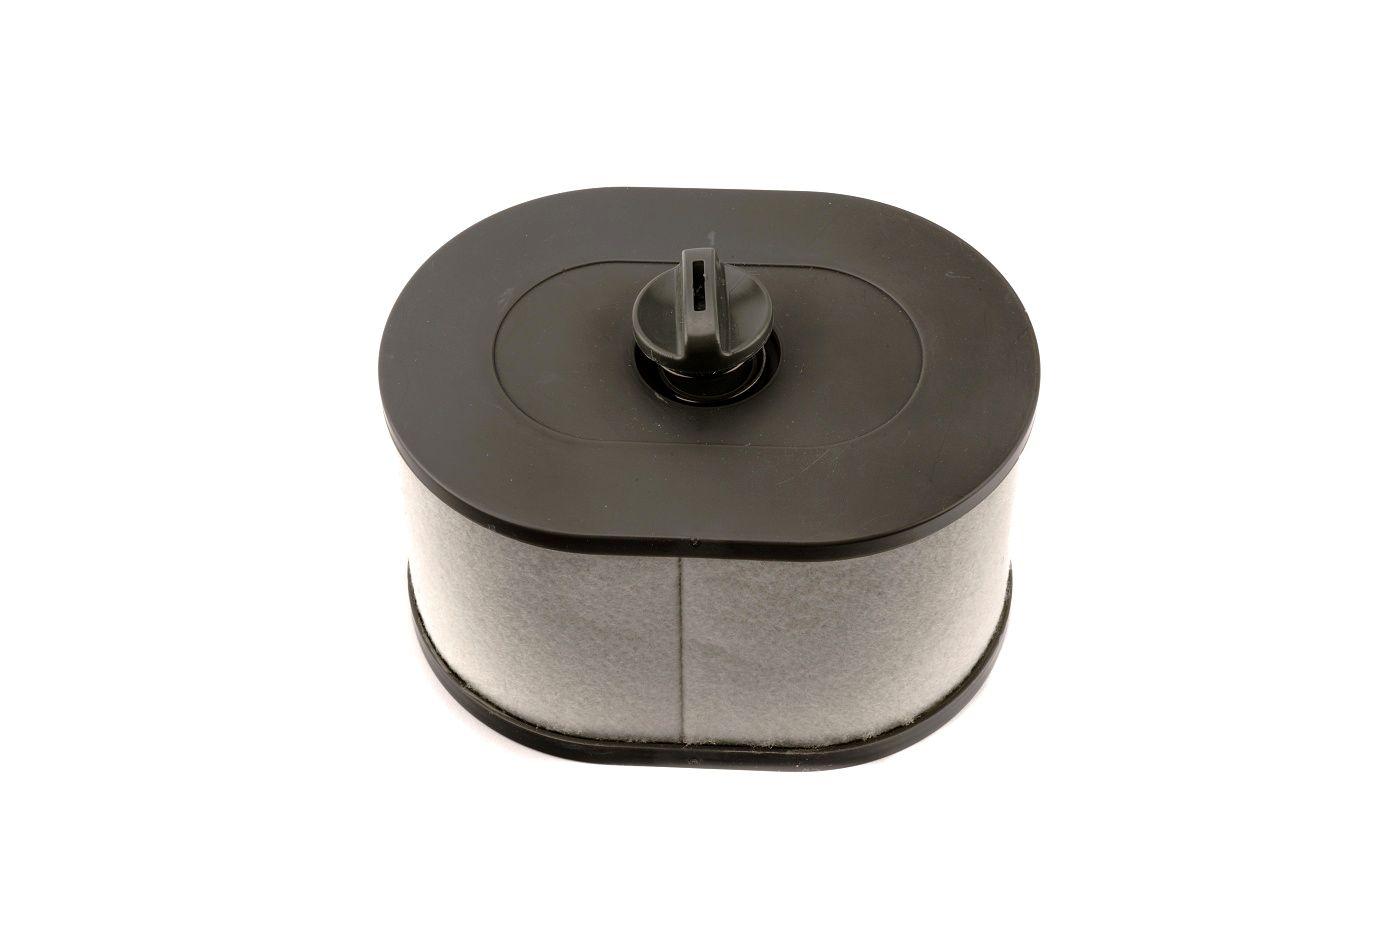 Vzduchový filtr Husqvarna Partner K970 K1260 EVEREST - 510 24 41-01